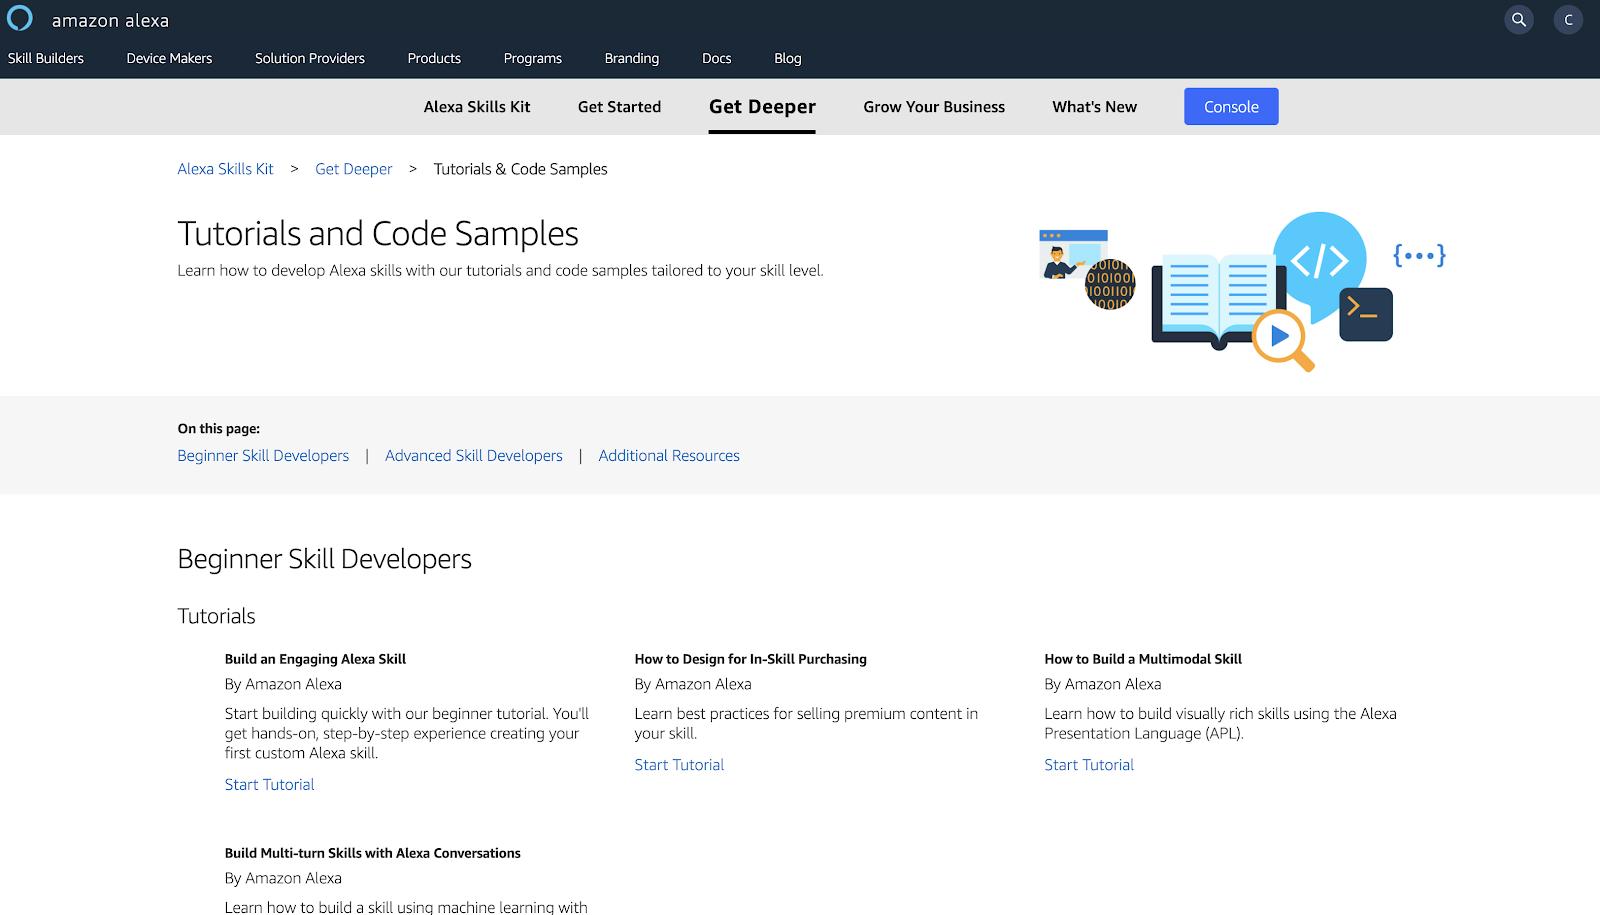 Amazon Alexa Documentation: Tutorials and Code Samples